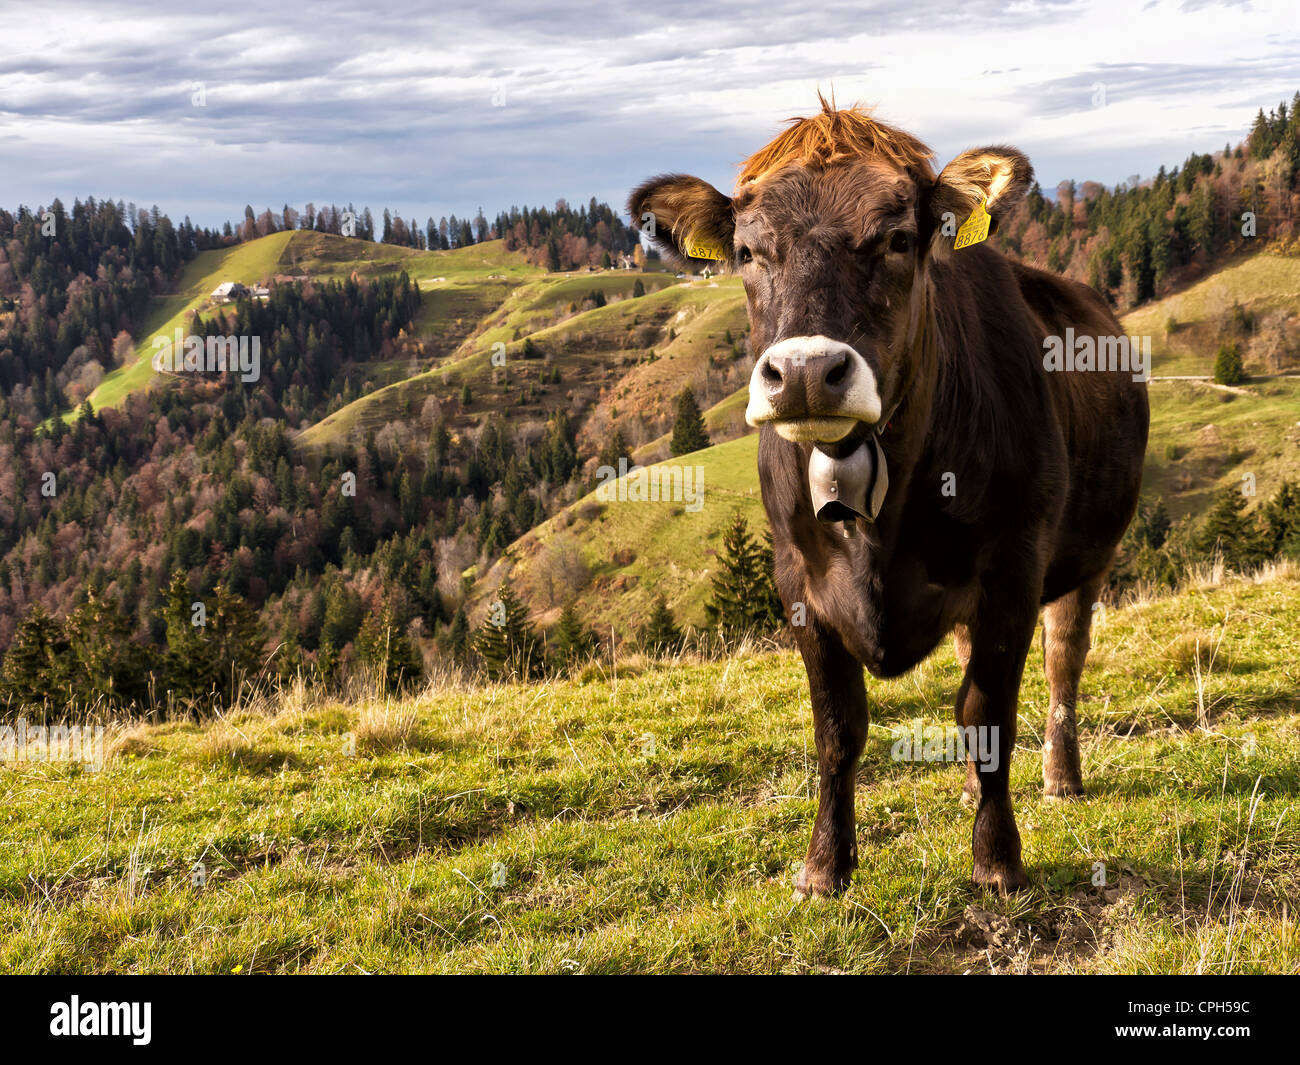 alp, shieling, alpine pasture, Emmental, agriculture, autumn, fall, canton Bern, cow, cattle, Lüderenalp, dairy, Stock Photo